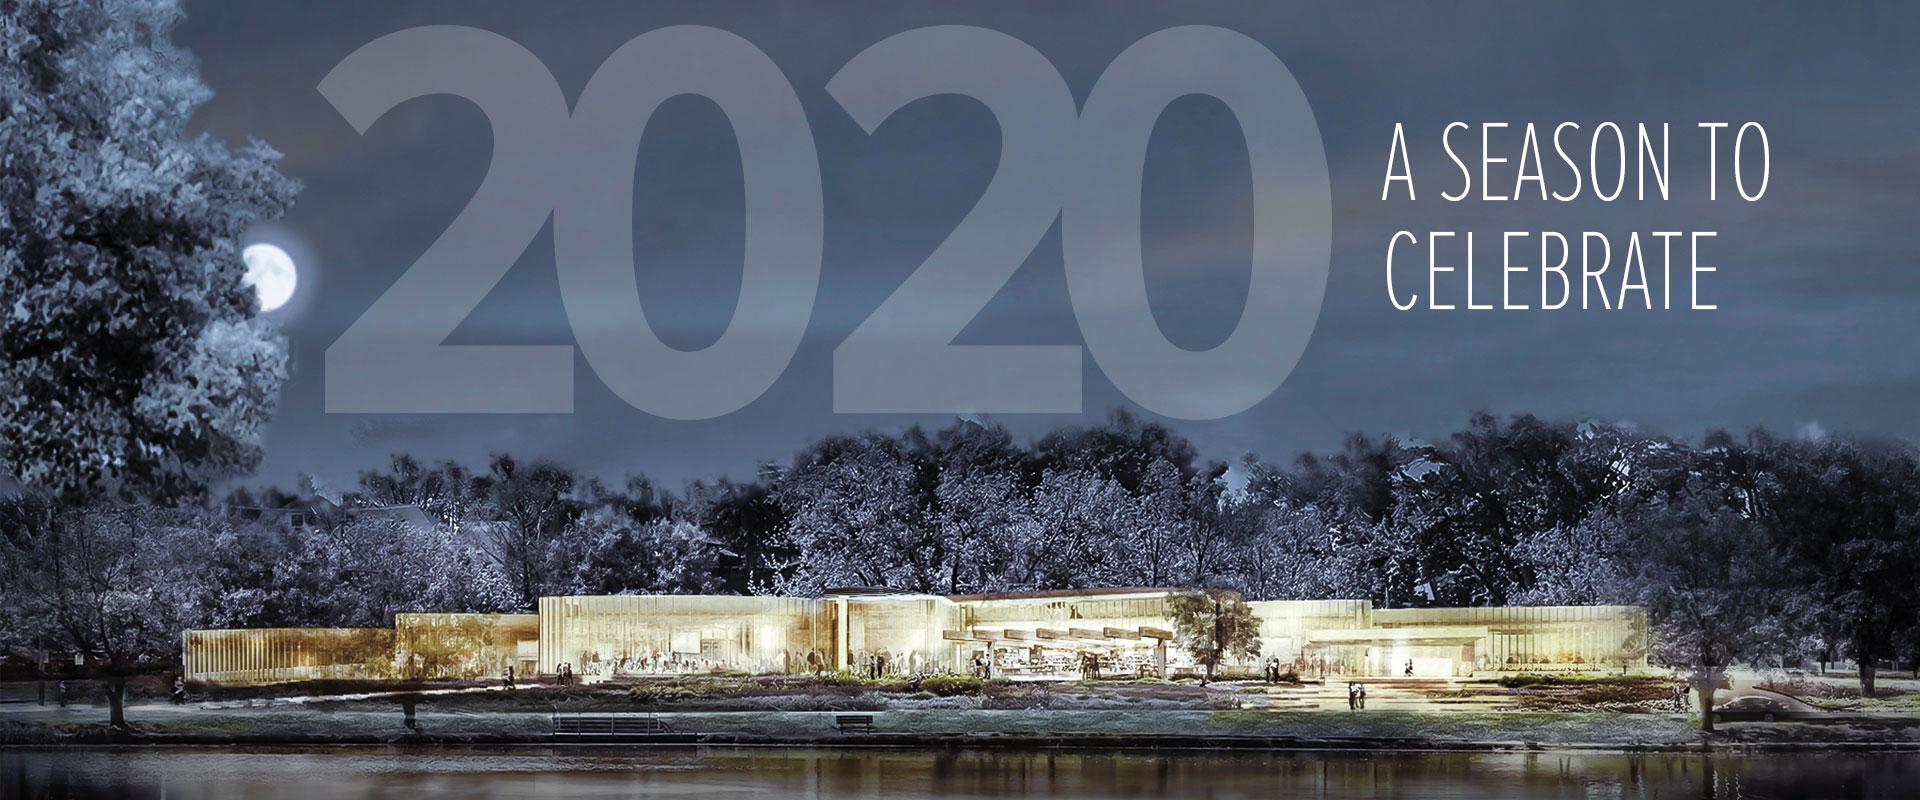 Stratford Festival 2020.What S On Discover Our 2020 Season Stratford Festival